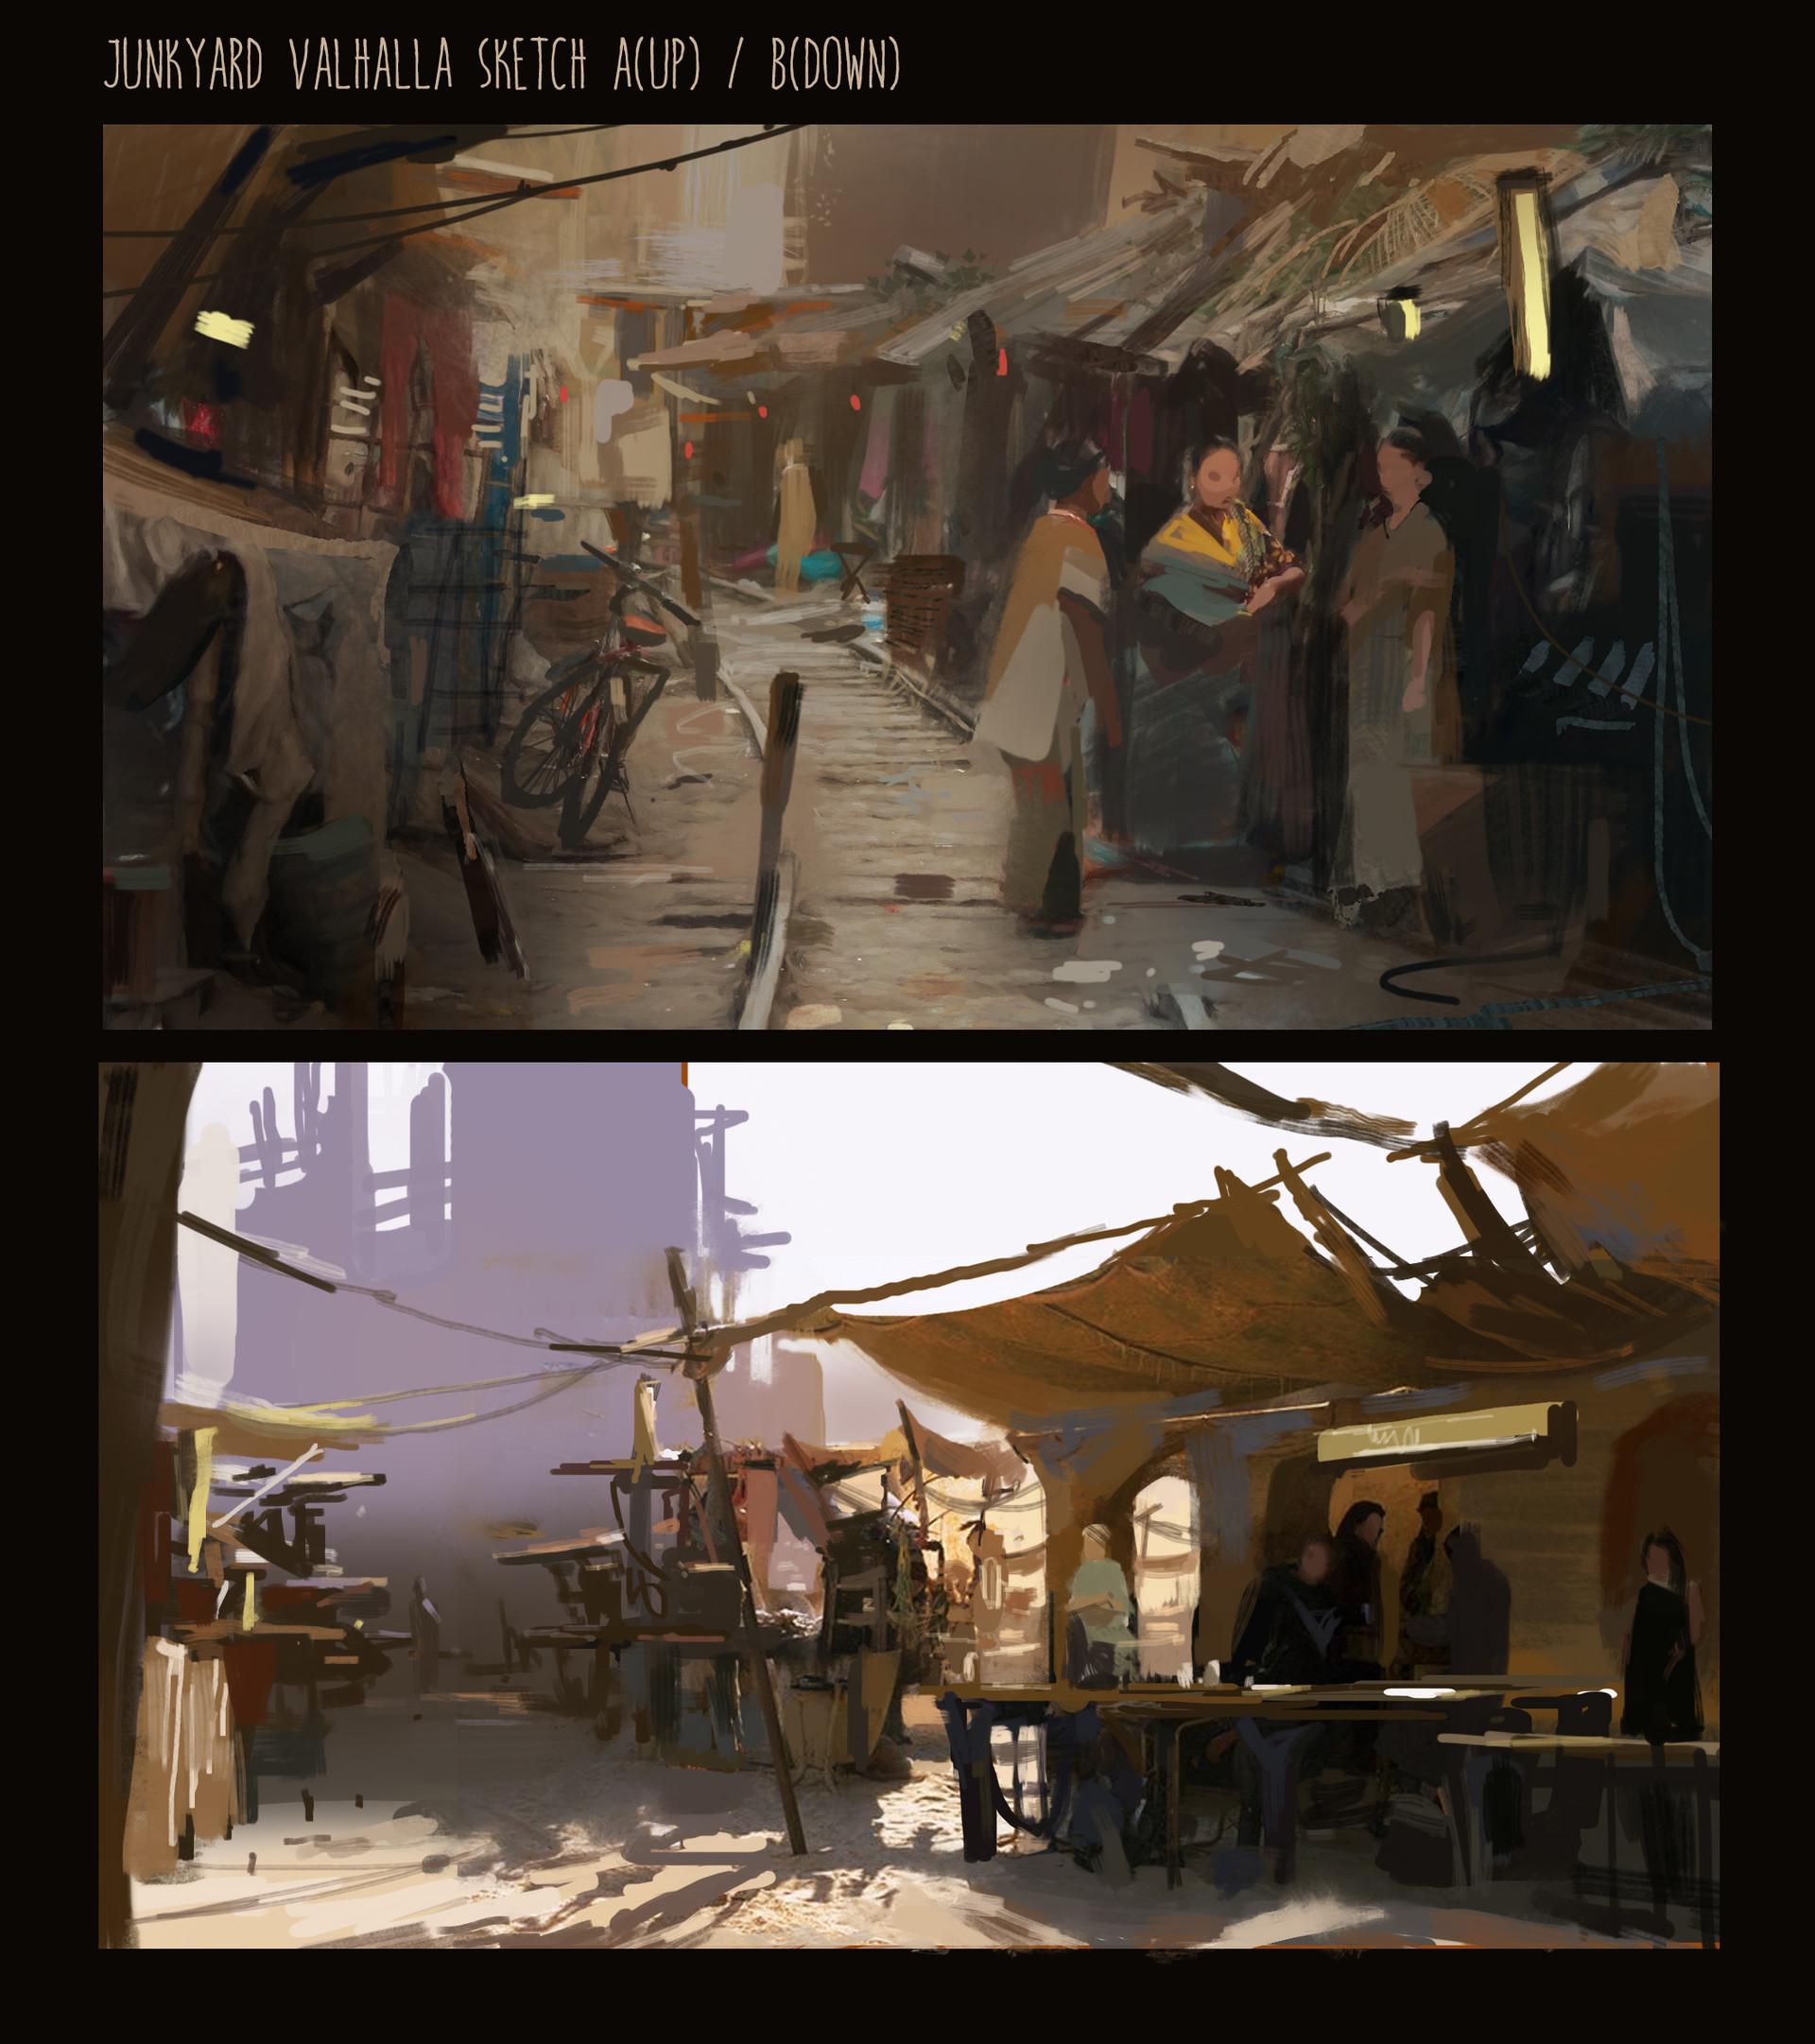 Yujin choo junkyard valhalla sketch